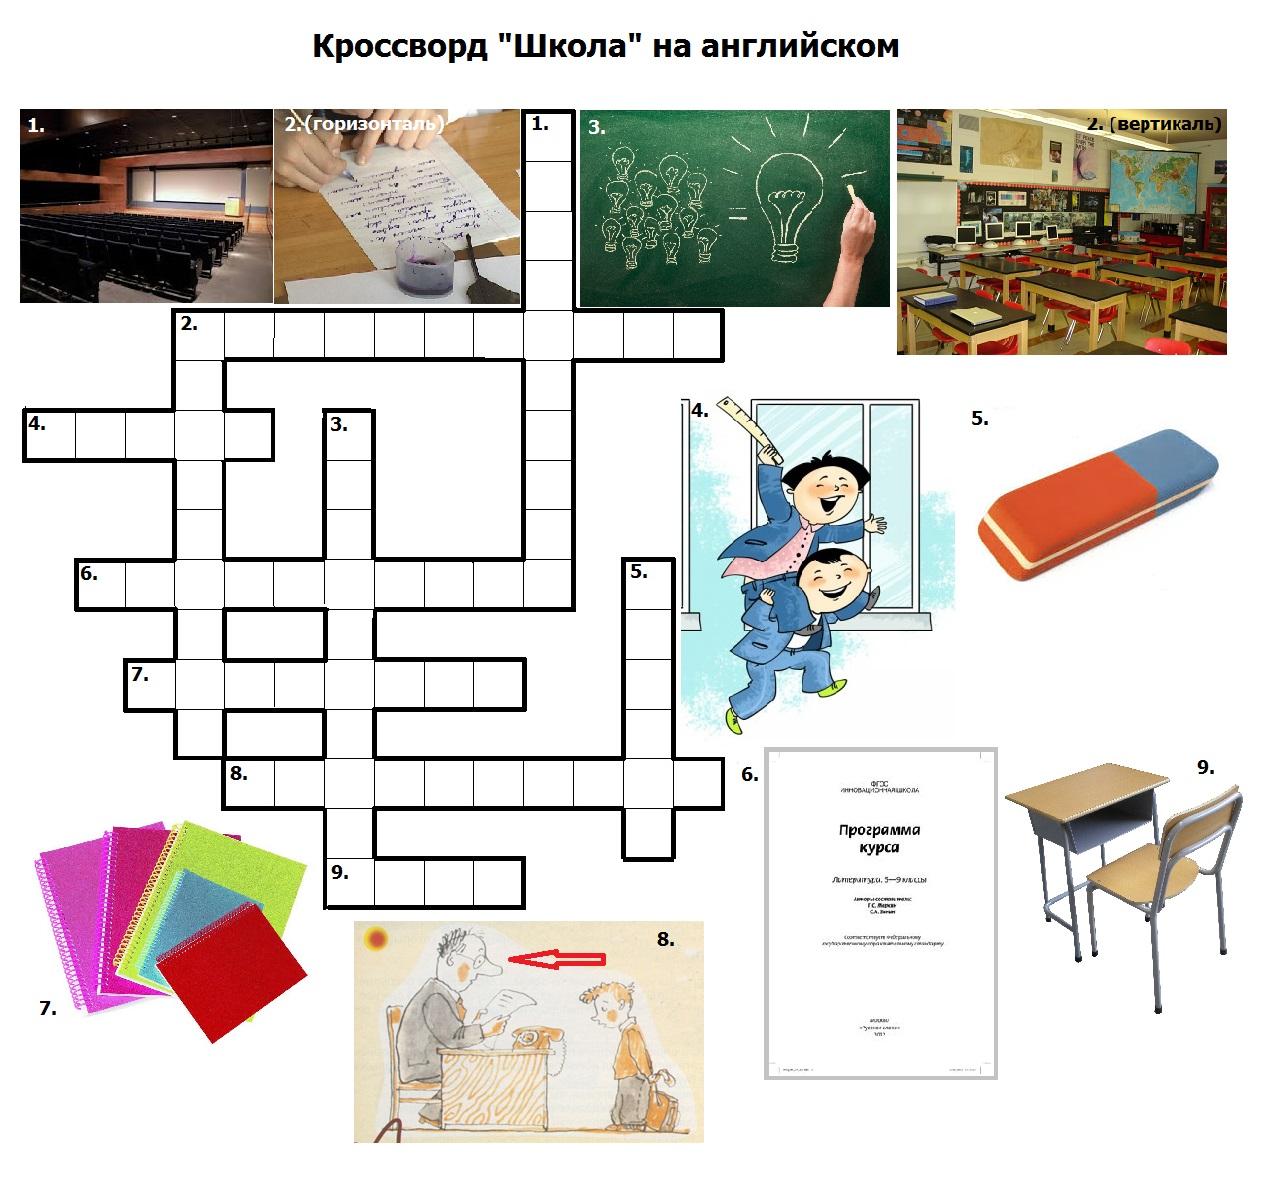 Кроссворд Школа на английском